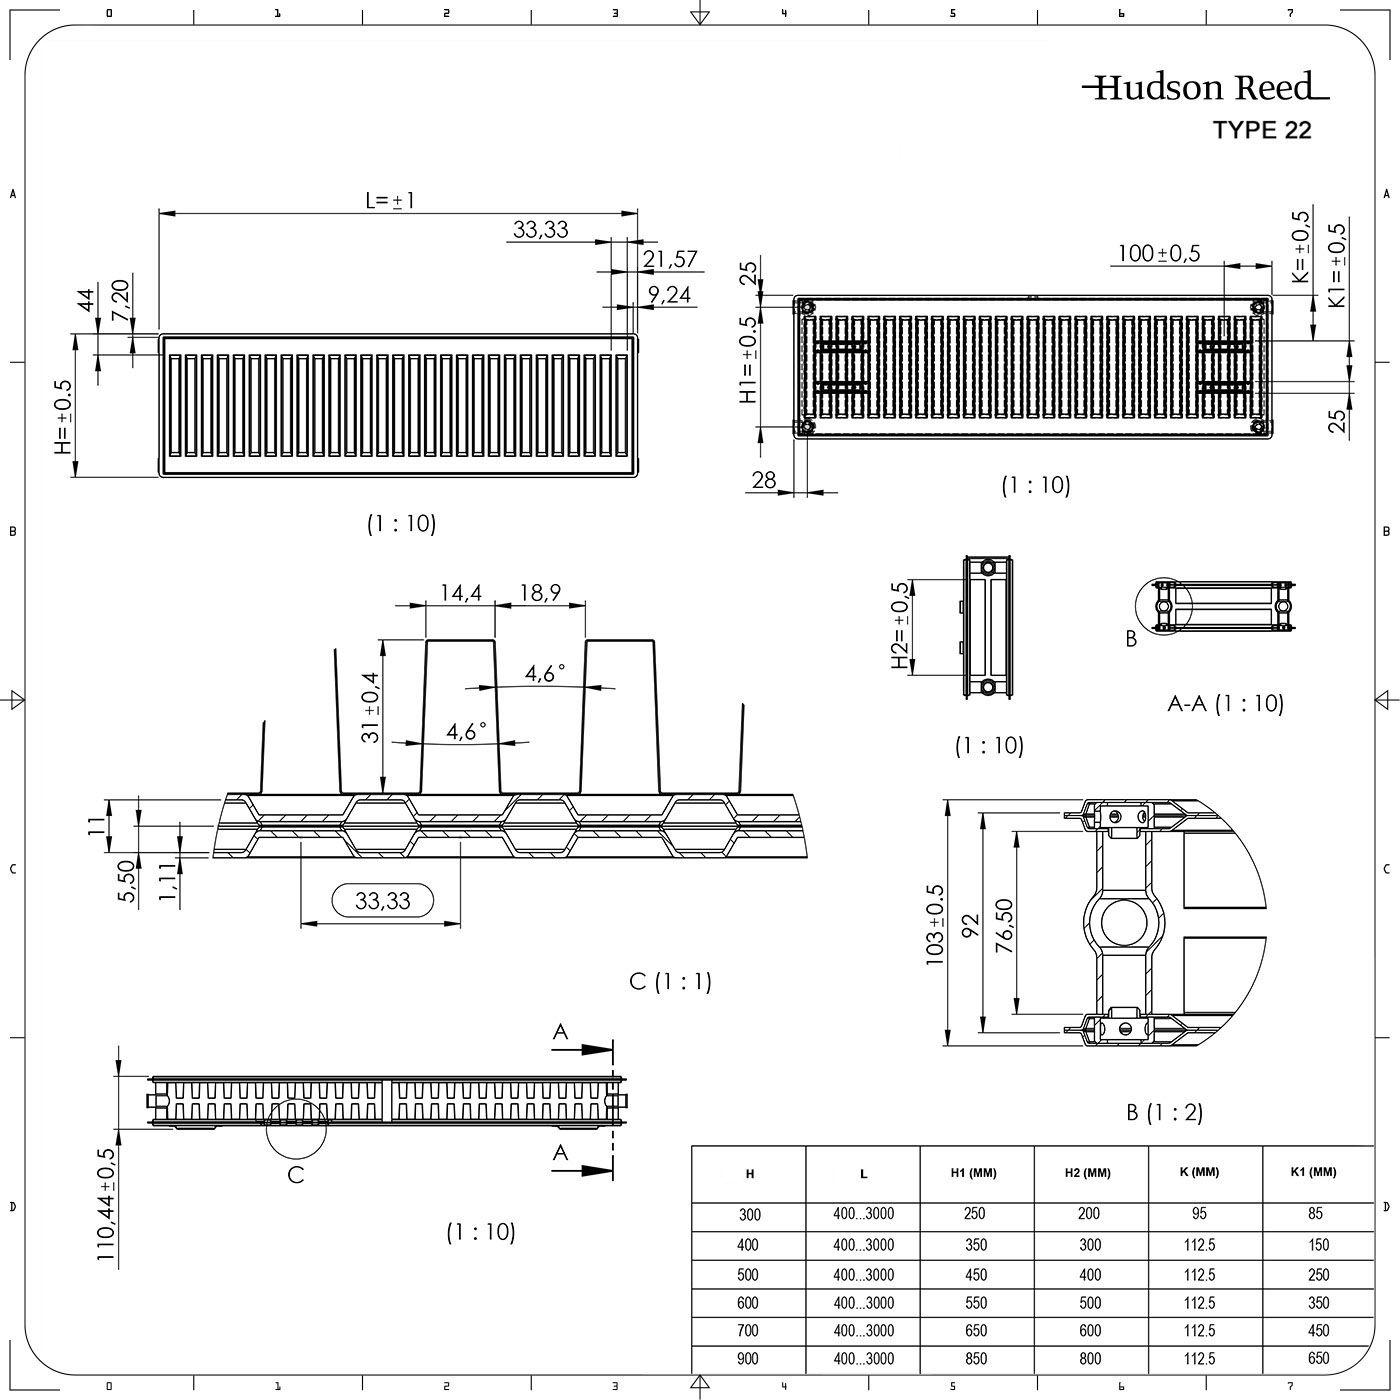 kompaktheizk rper horizontal typ 22 wei 400mm x 1200mm 1387w eco. Black Bedroom Furniture Sets. Home Design Ideas